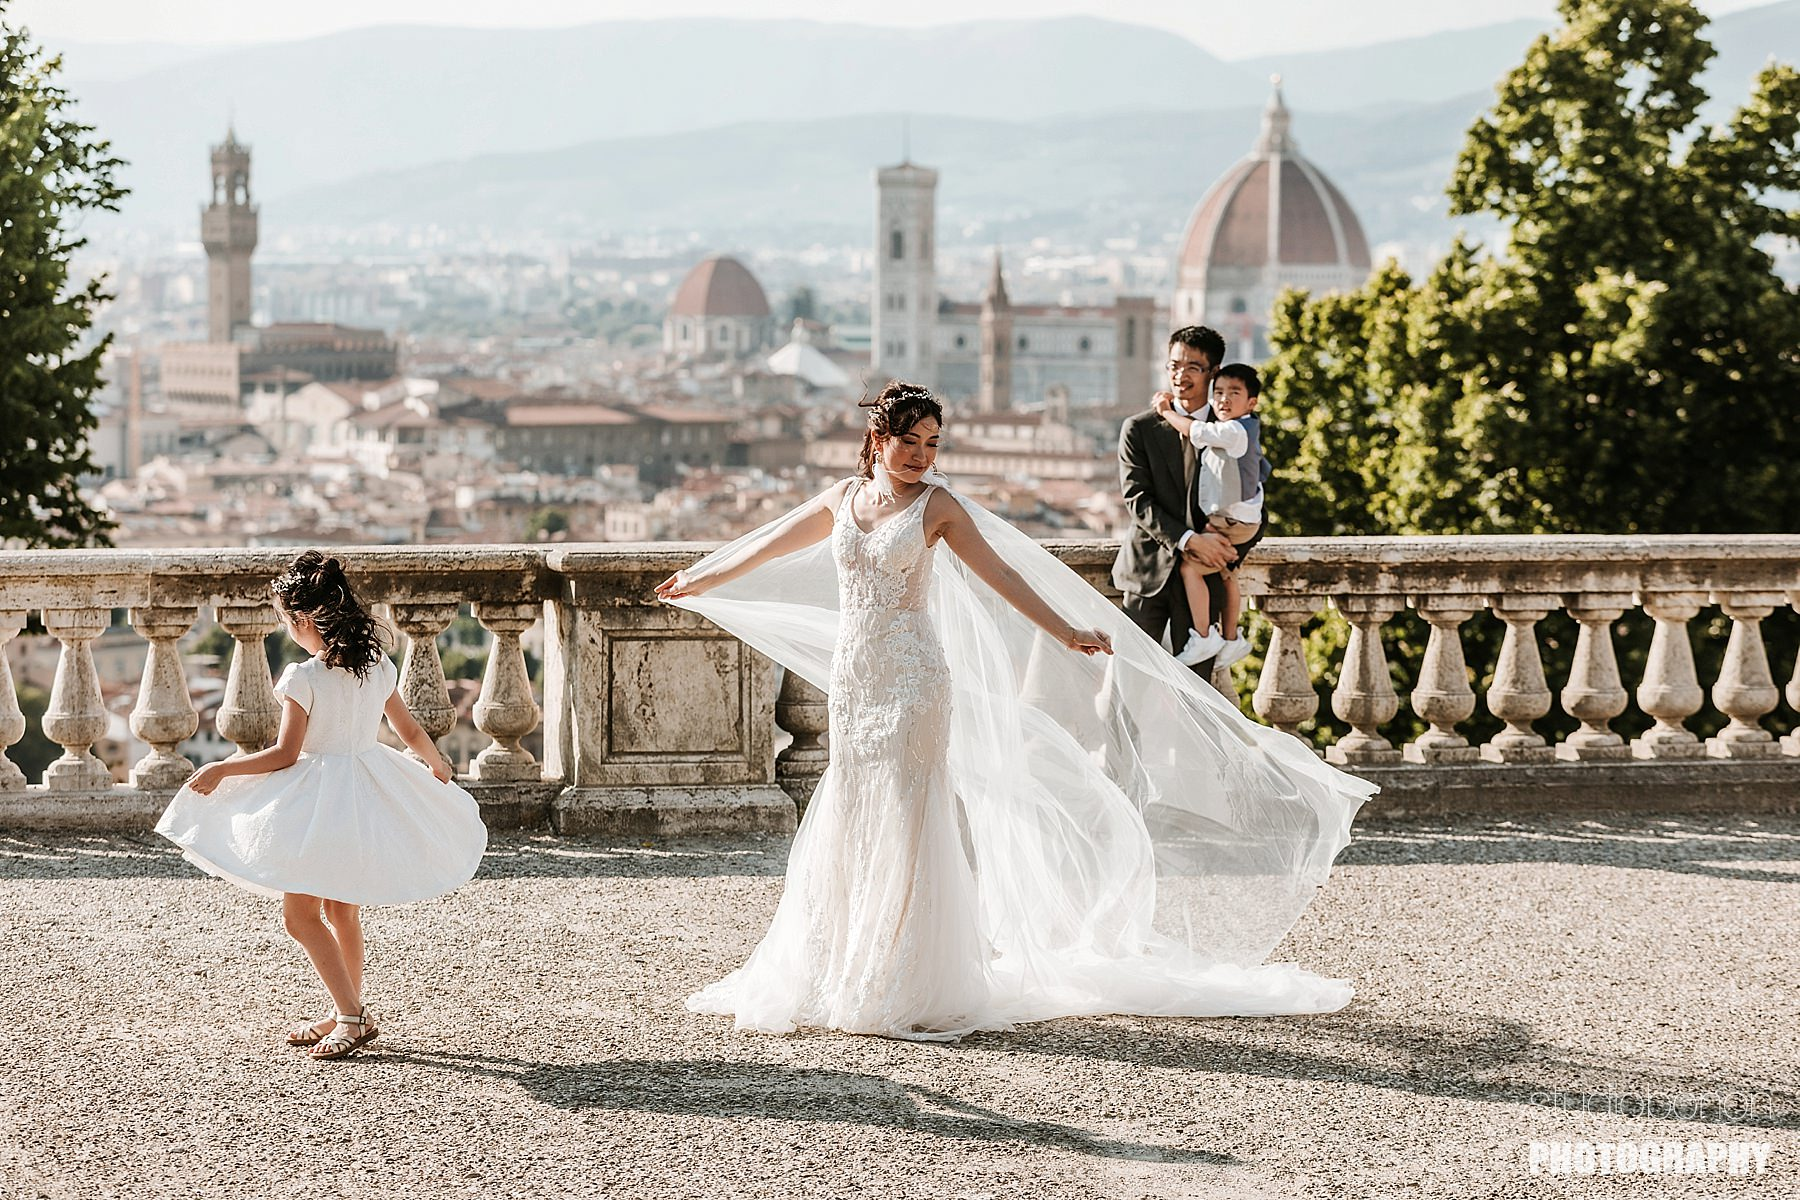 Family Wedding Photographer in Florence Tuscany